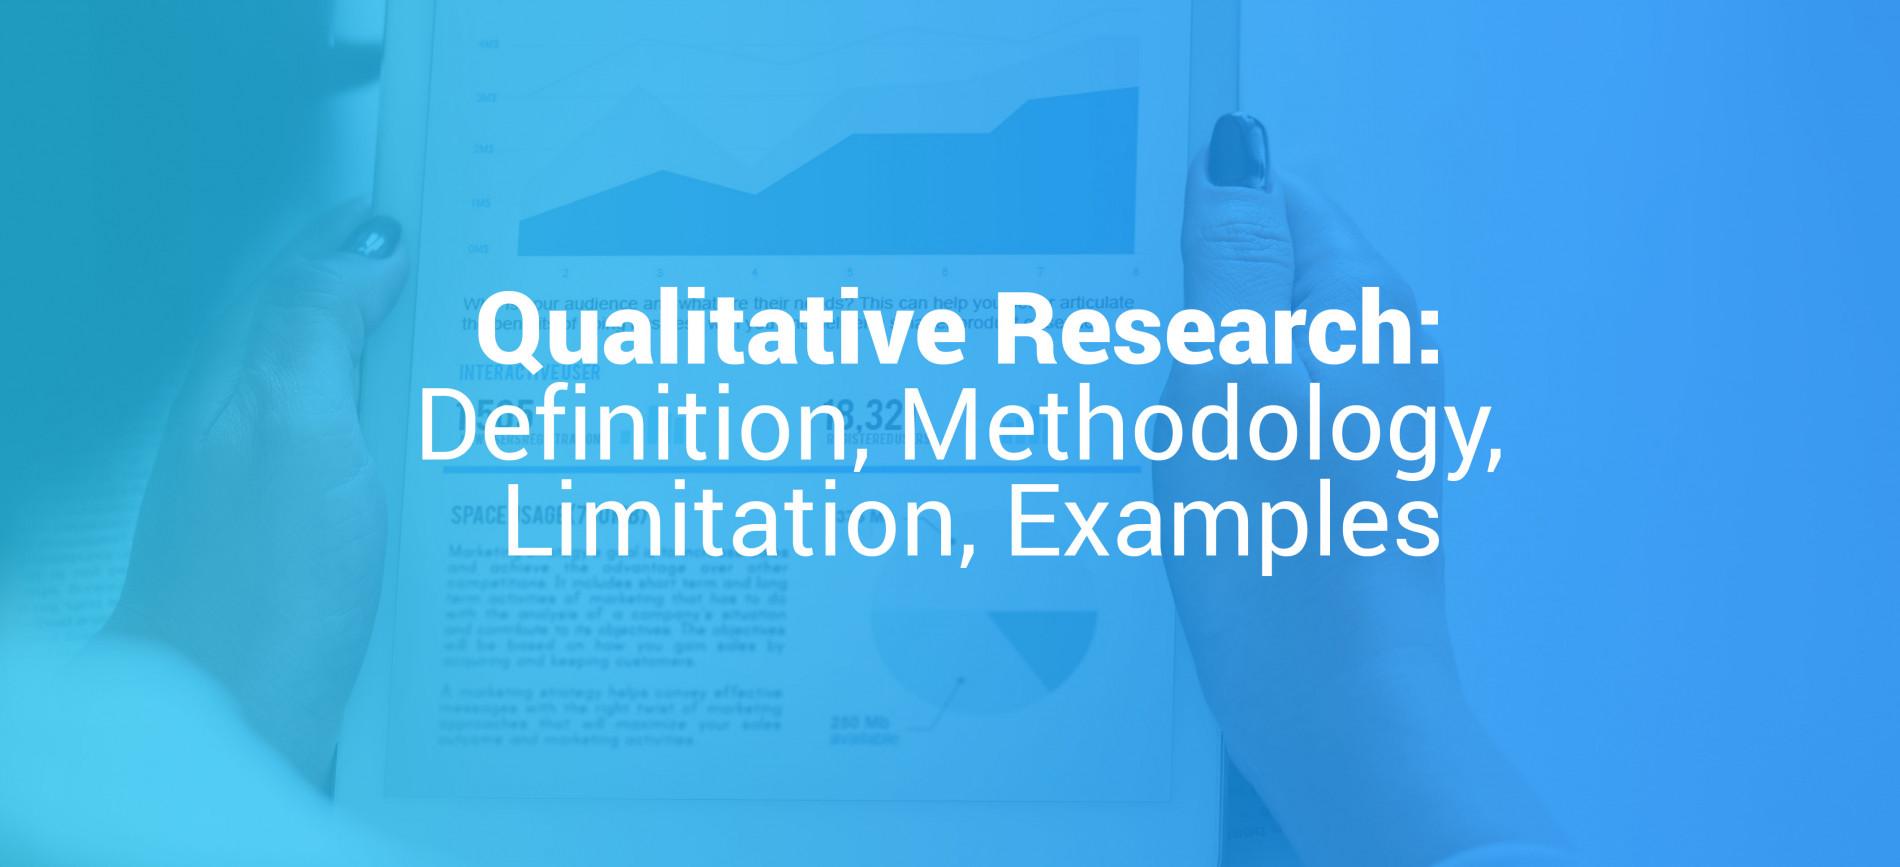 Qualitative Research: Definition, Methodology, Limitation